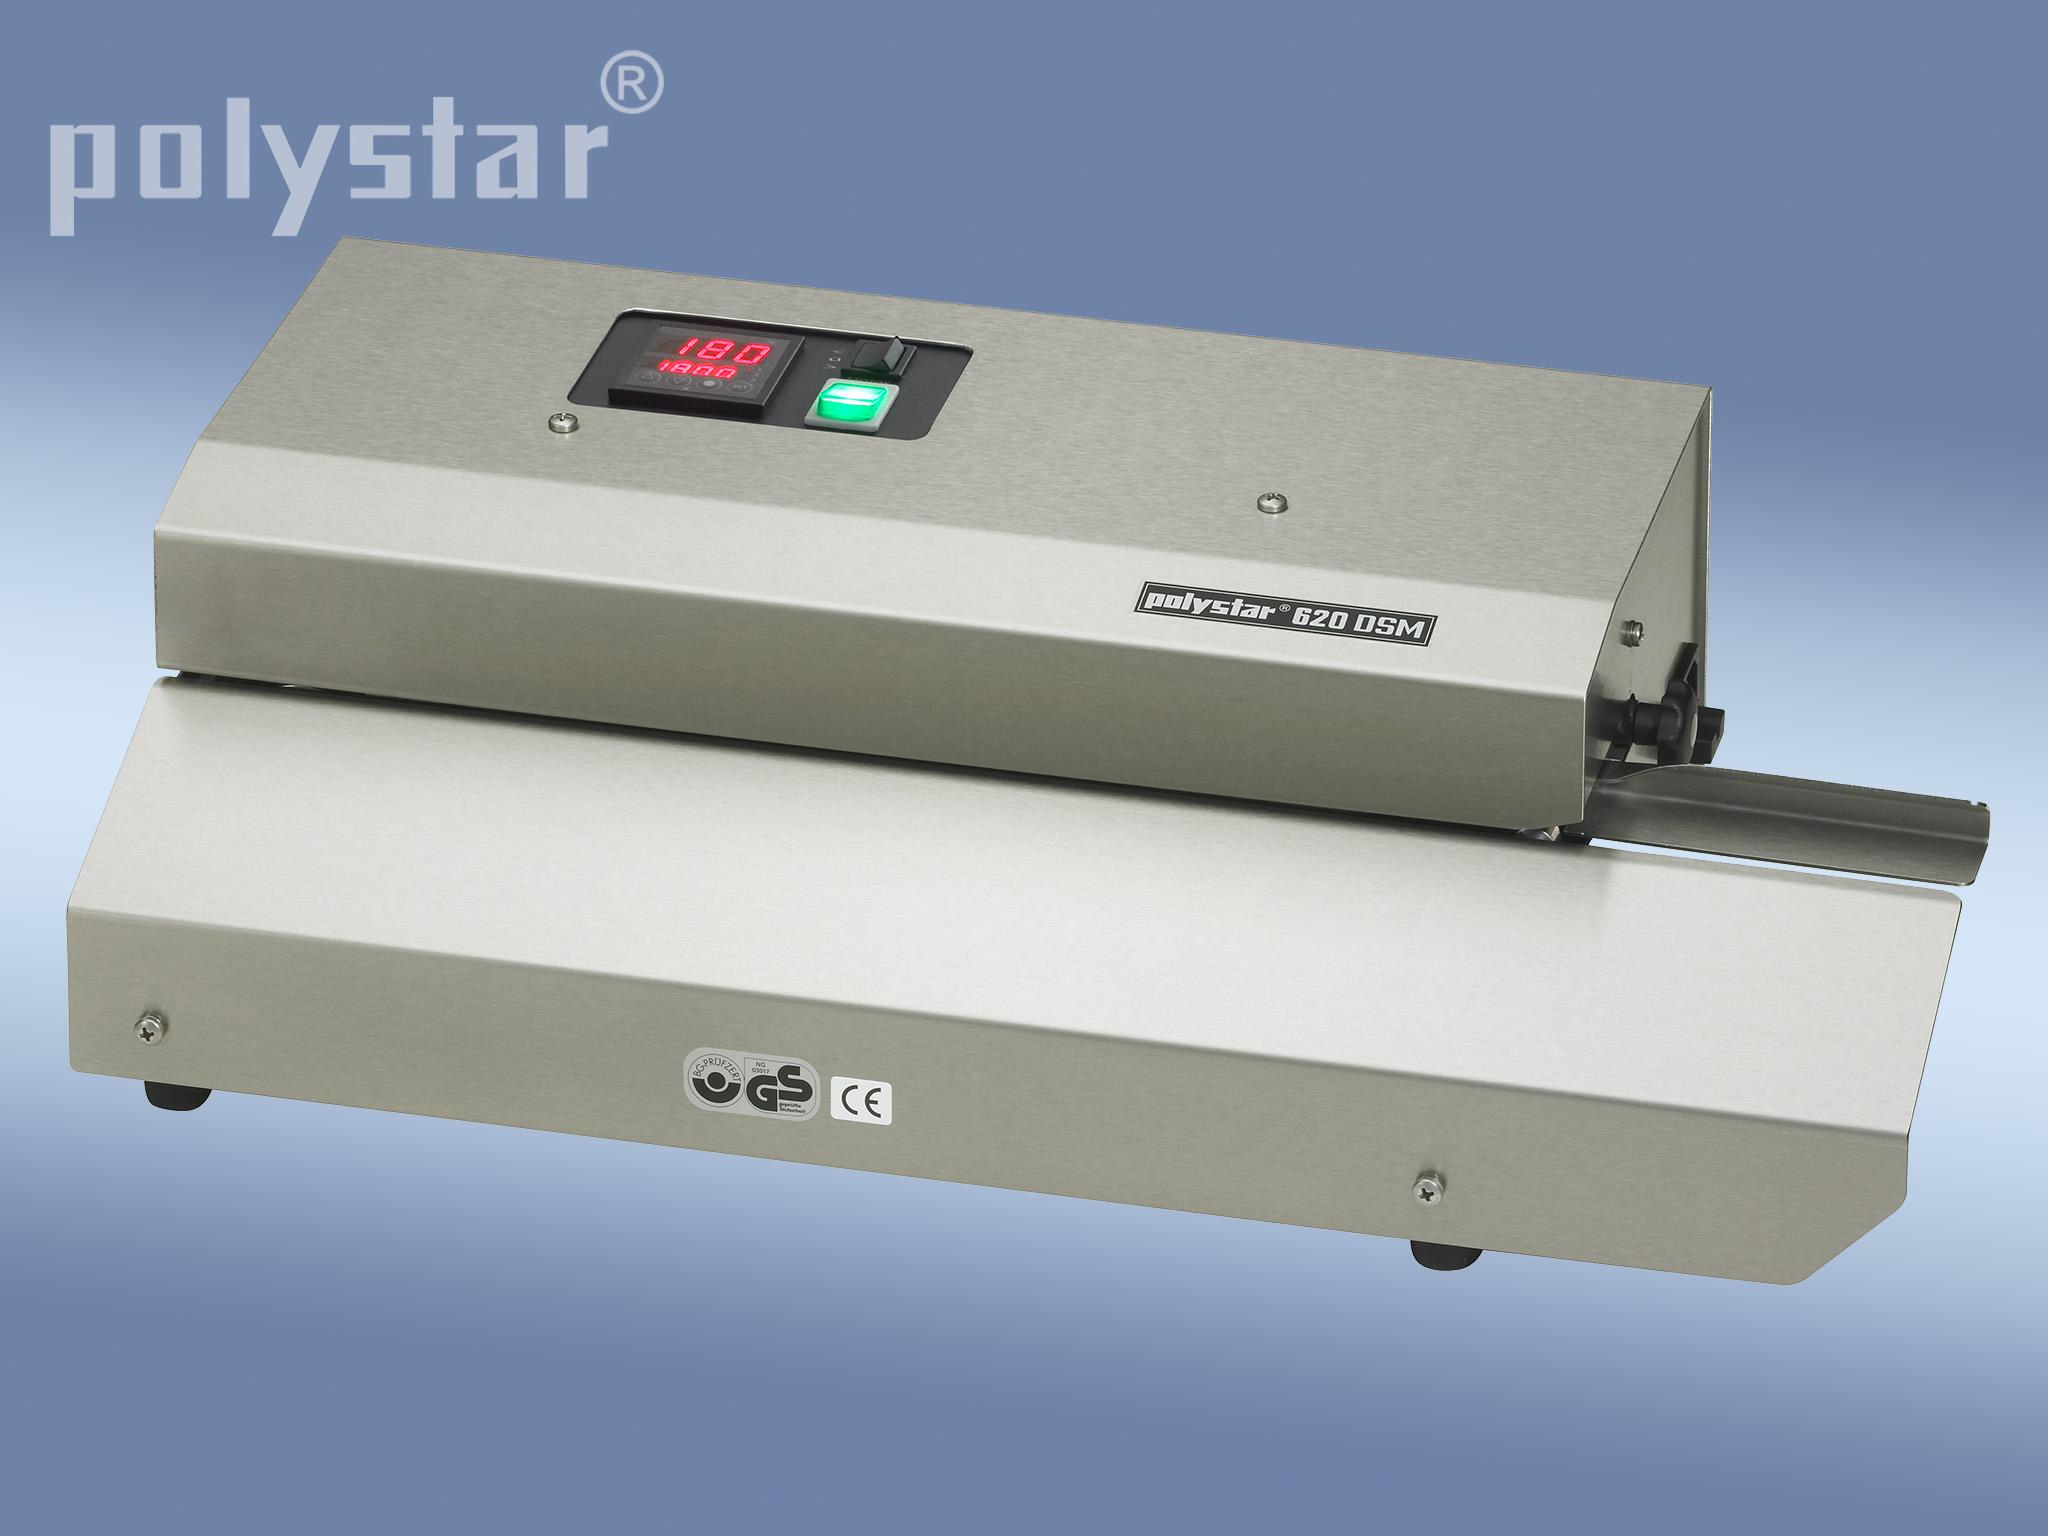 polystar-620-dsm